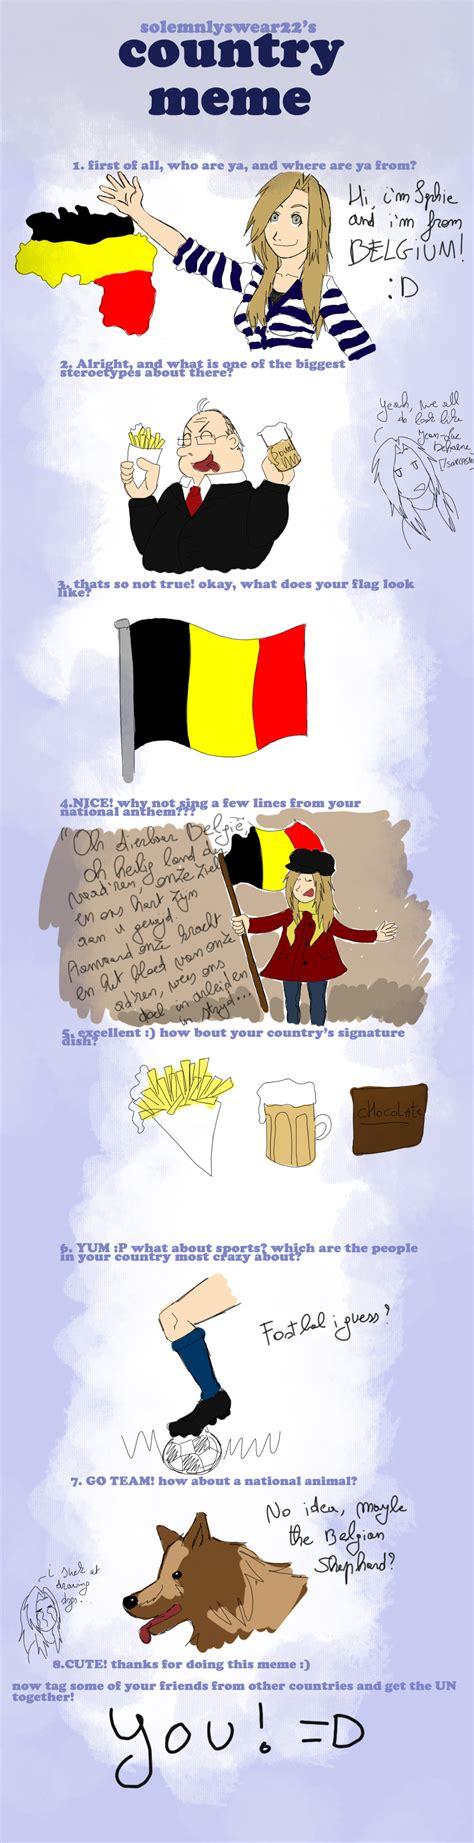 Belgium Meme - country meme belgium by weasley achemist93 on deviantart